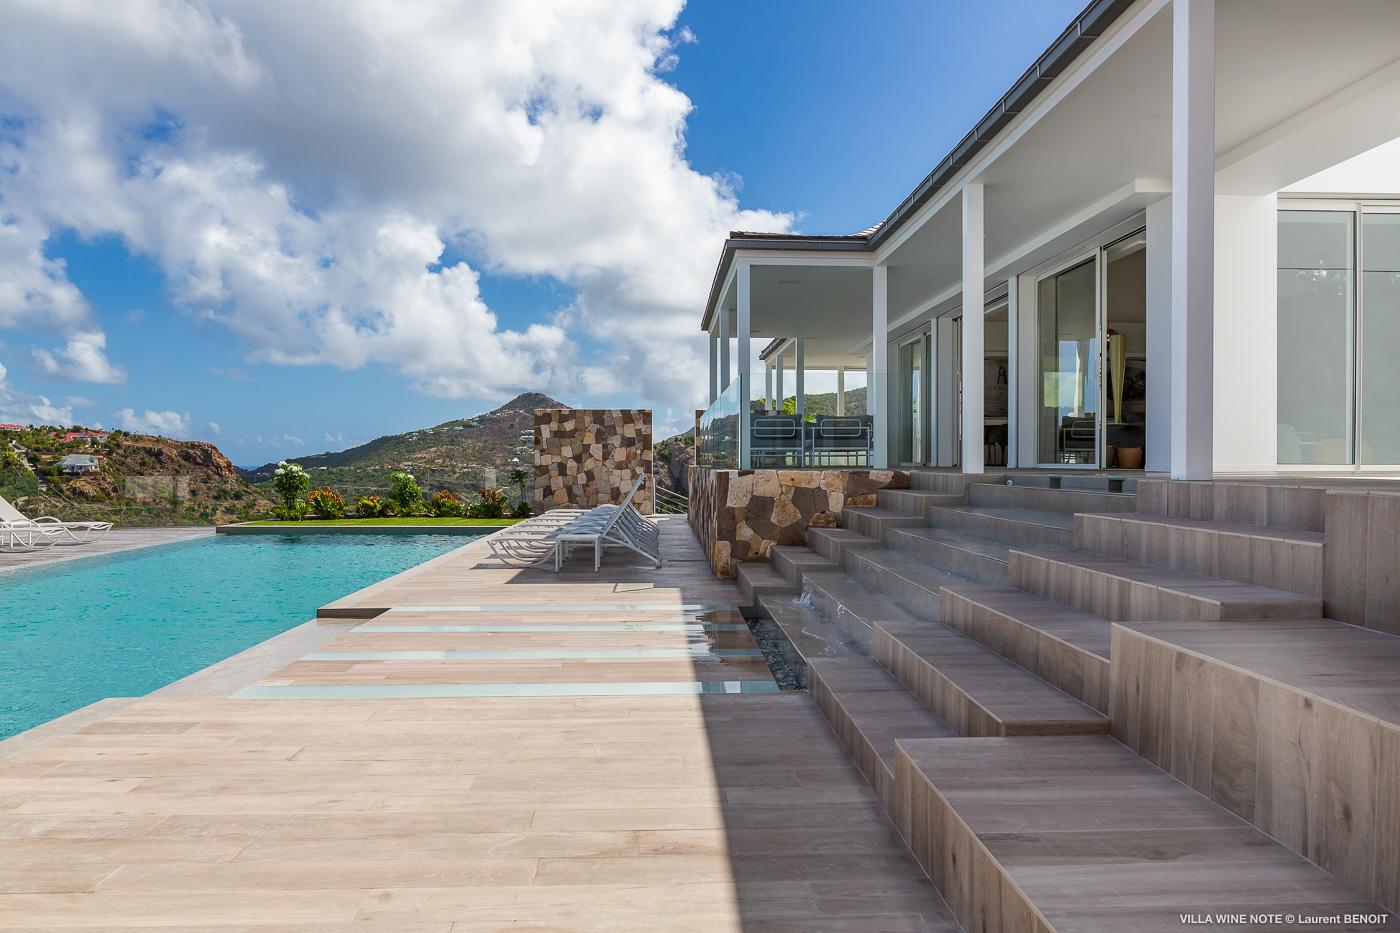 Luxury villa rentals caribbean - St barthelemy - Saint jean - No location 4 - Wine Note - Image 1/74